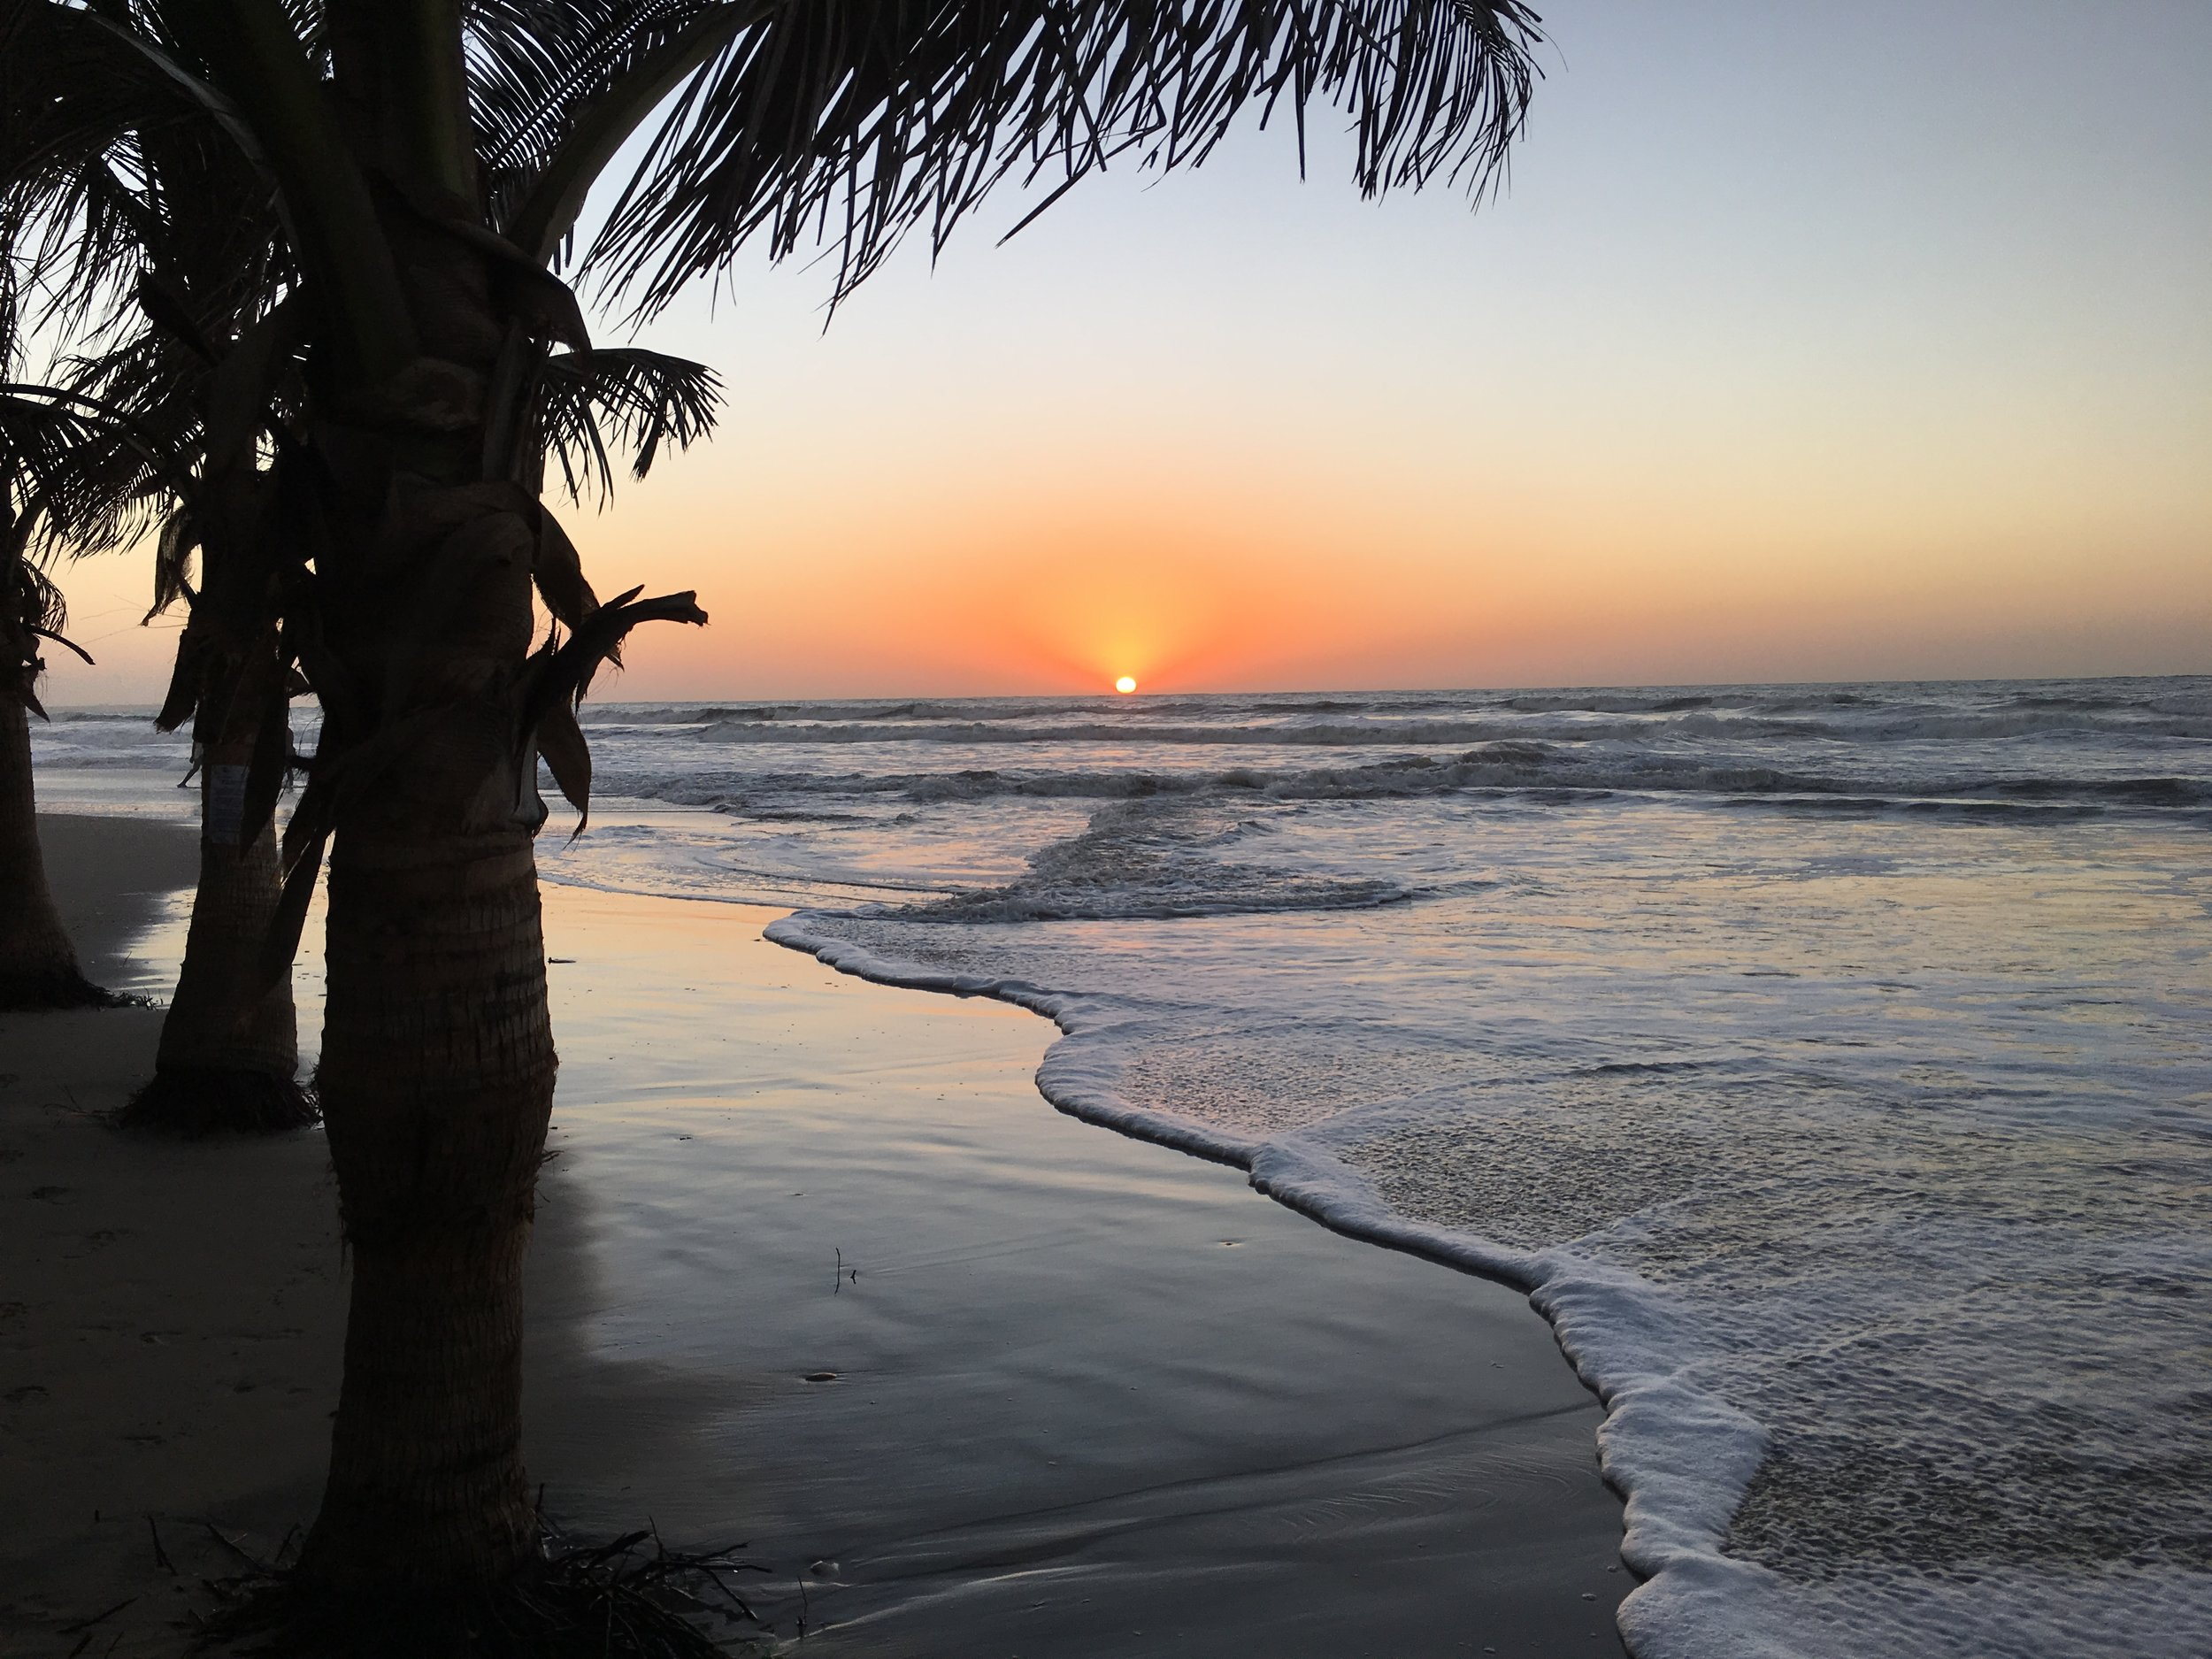 13 Pocoloco Beach Kololi The Gambia (Kathy).JPG